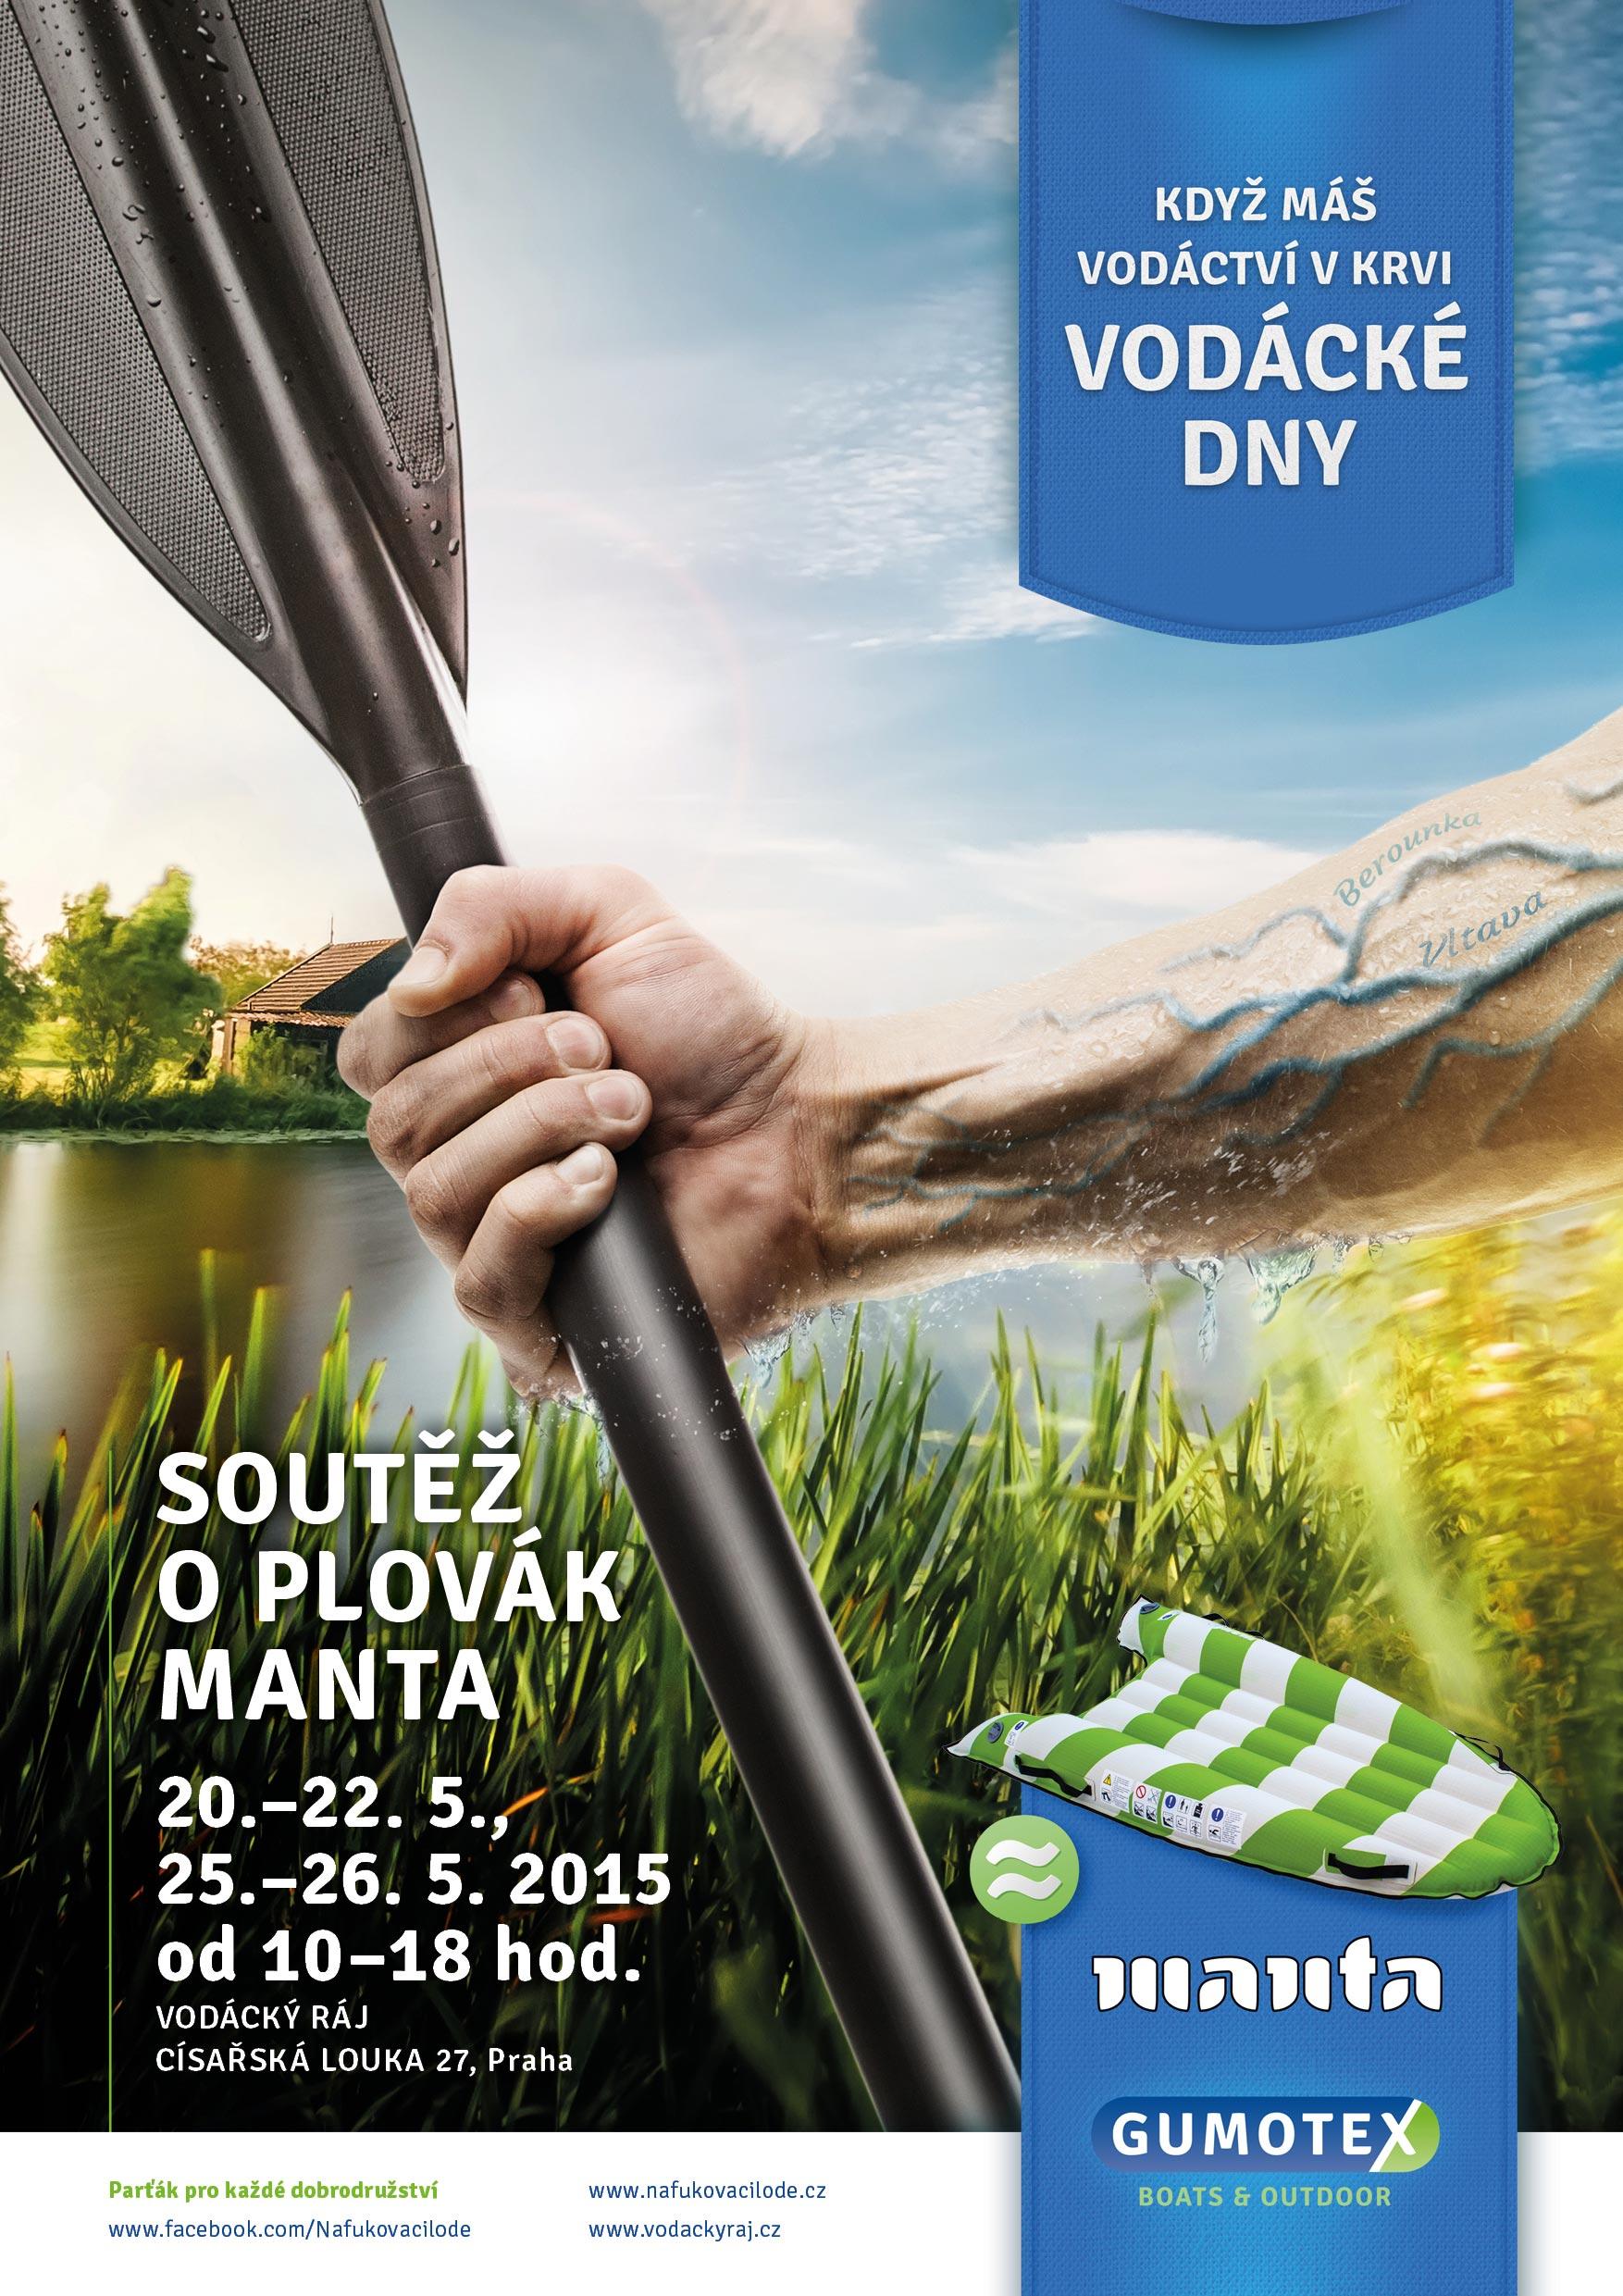 Vodácké dny Gumotex - Praha